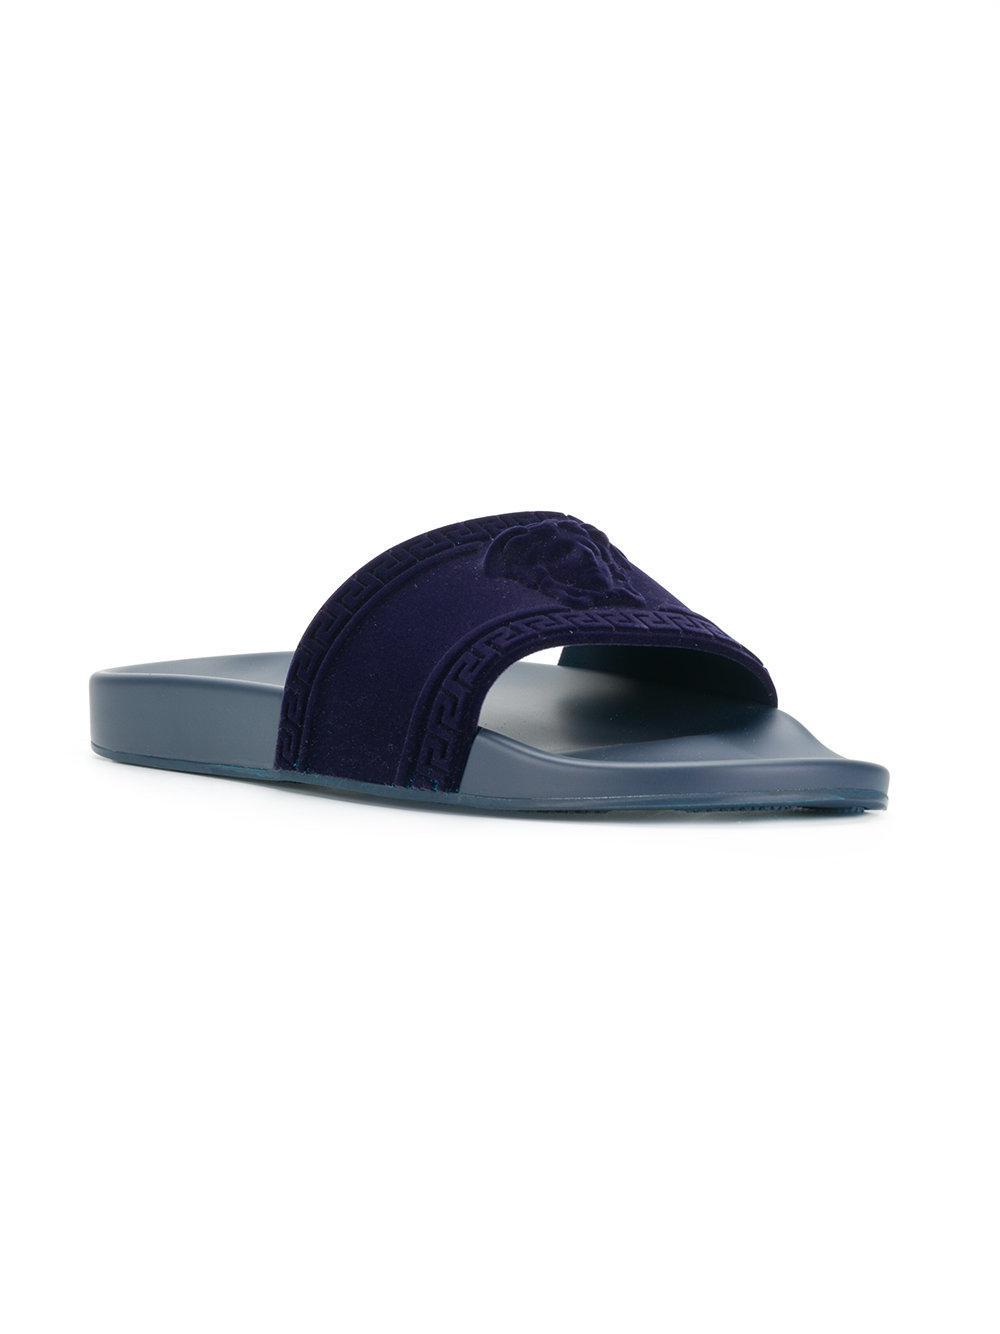 d2434fd4fd23 Lyst - Versace Medusa Slides in Blue for Men